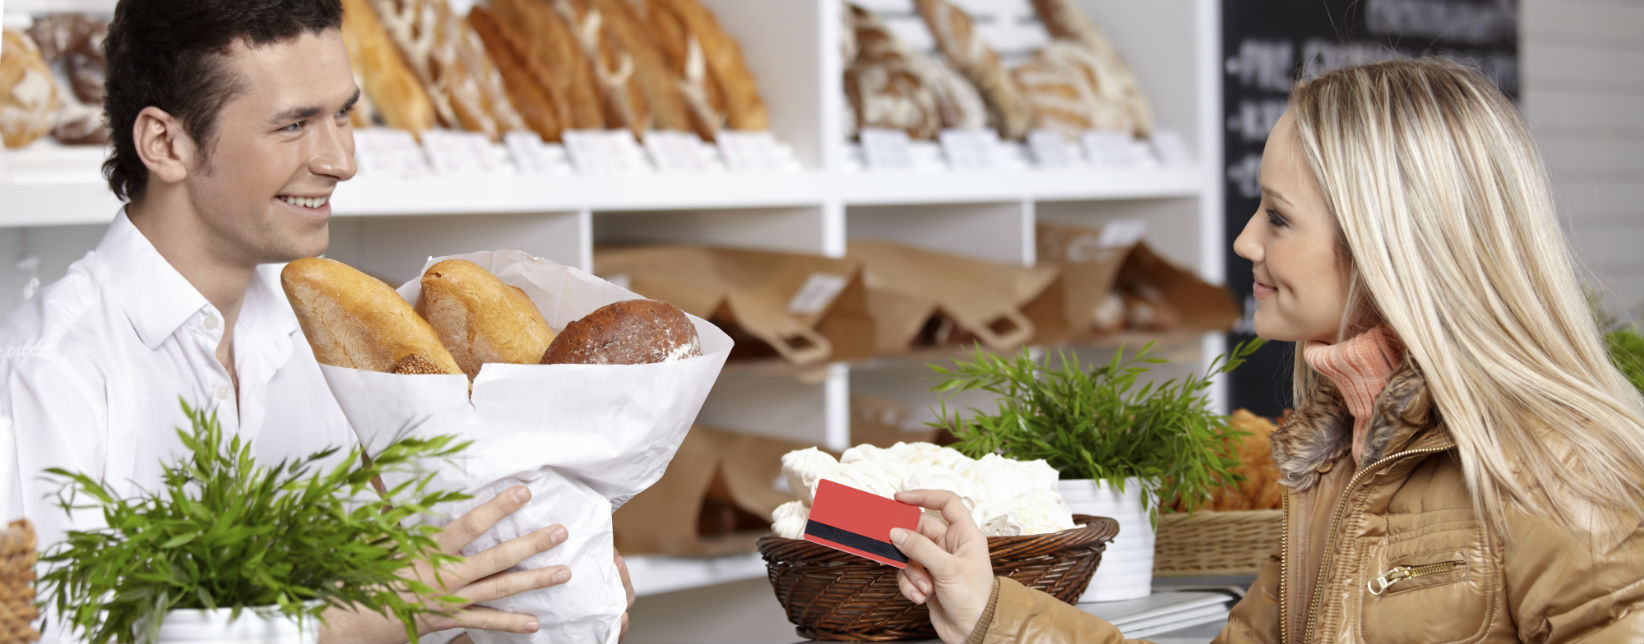 Restaurant Credit Card Processing Merchant Services